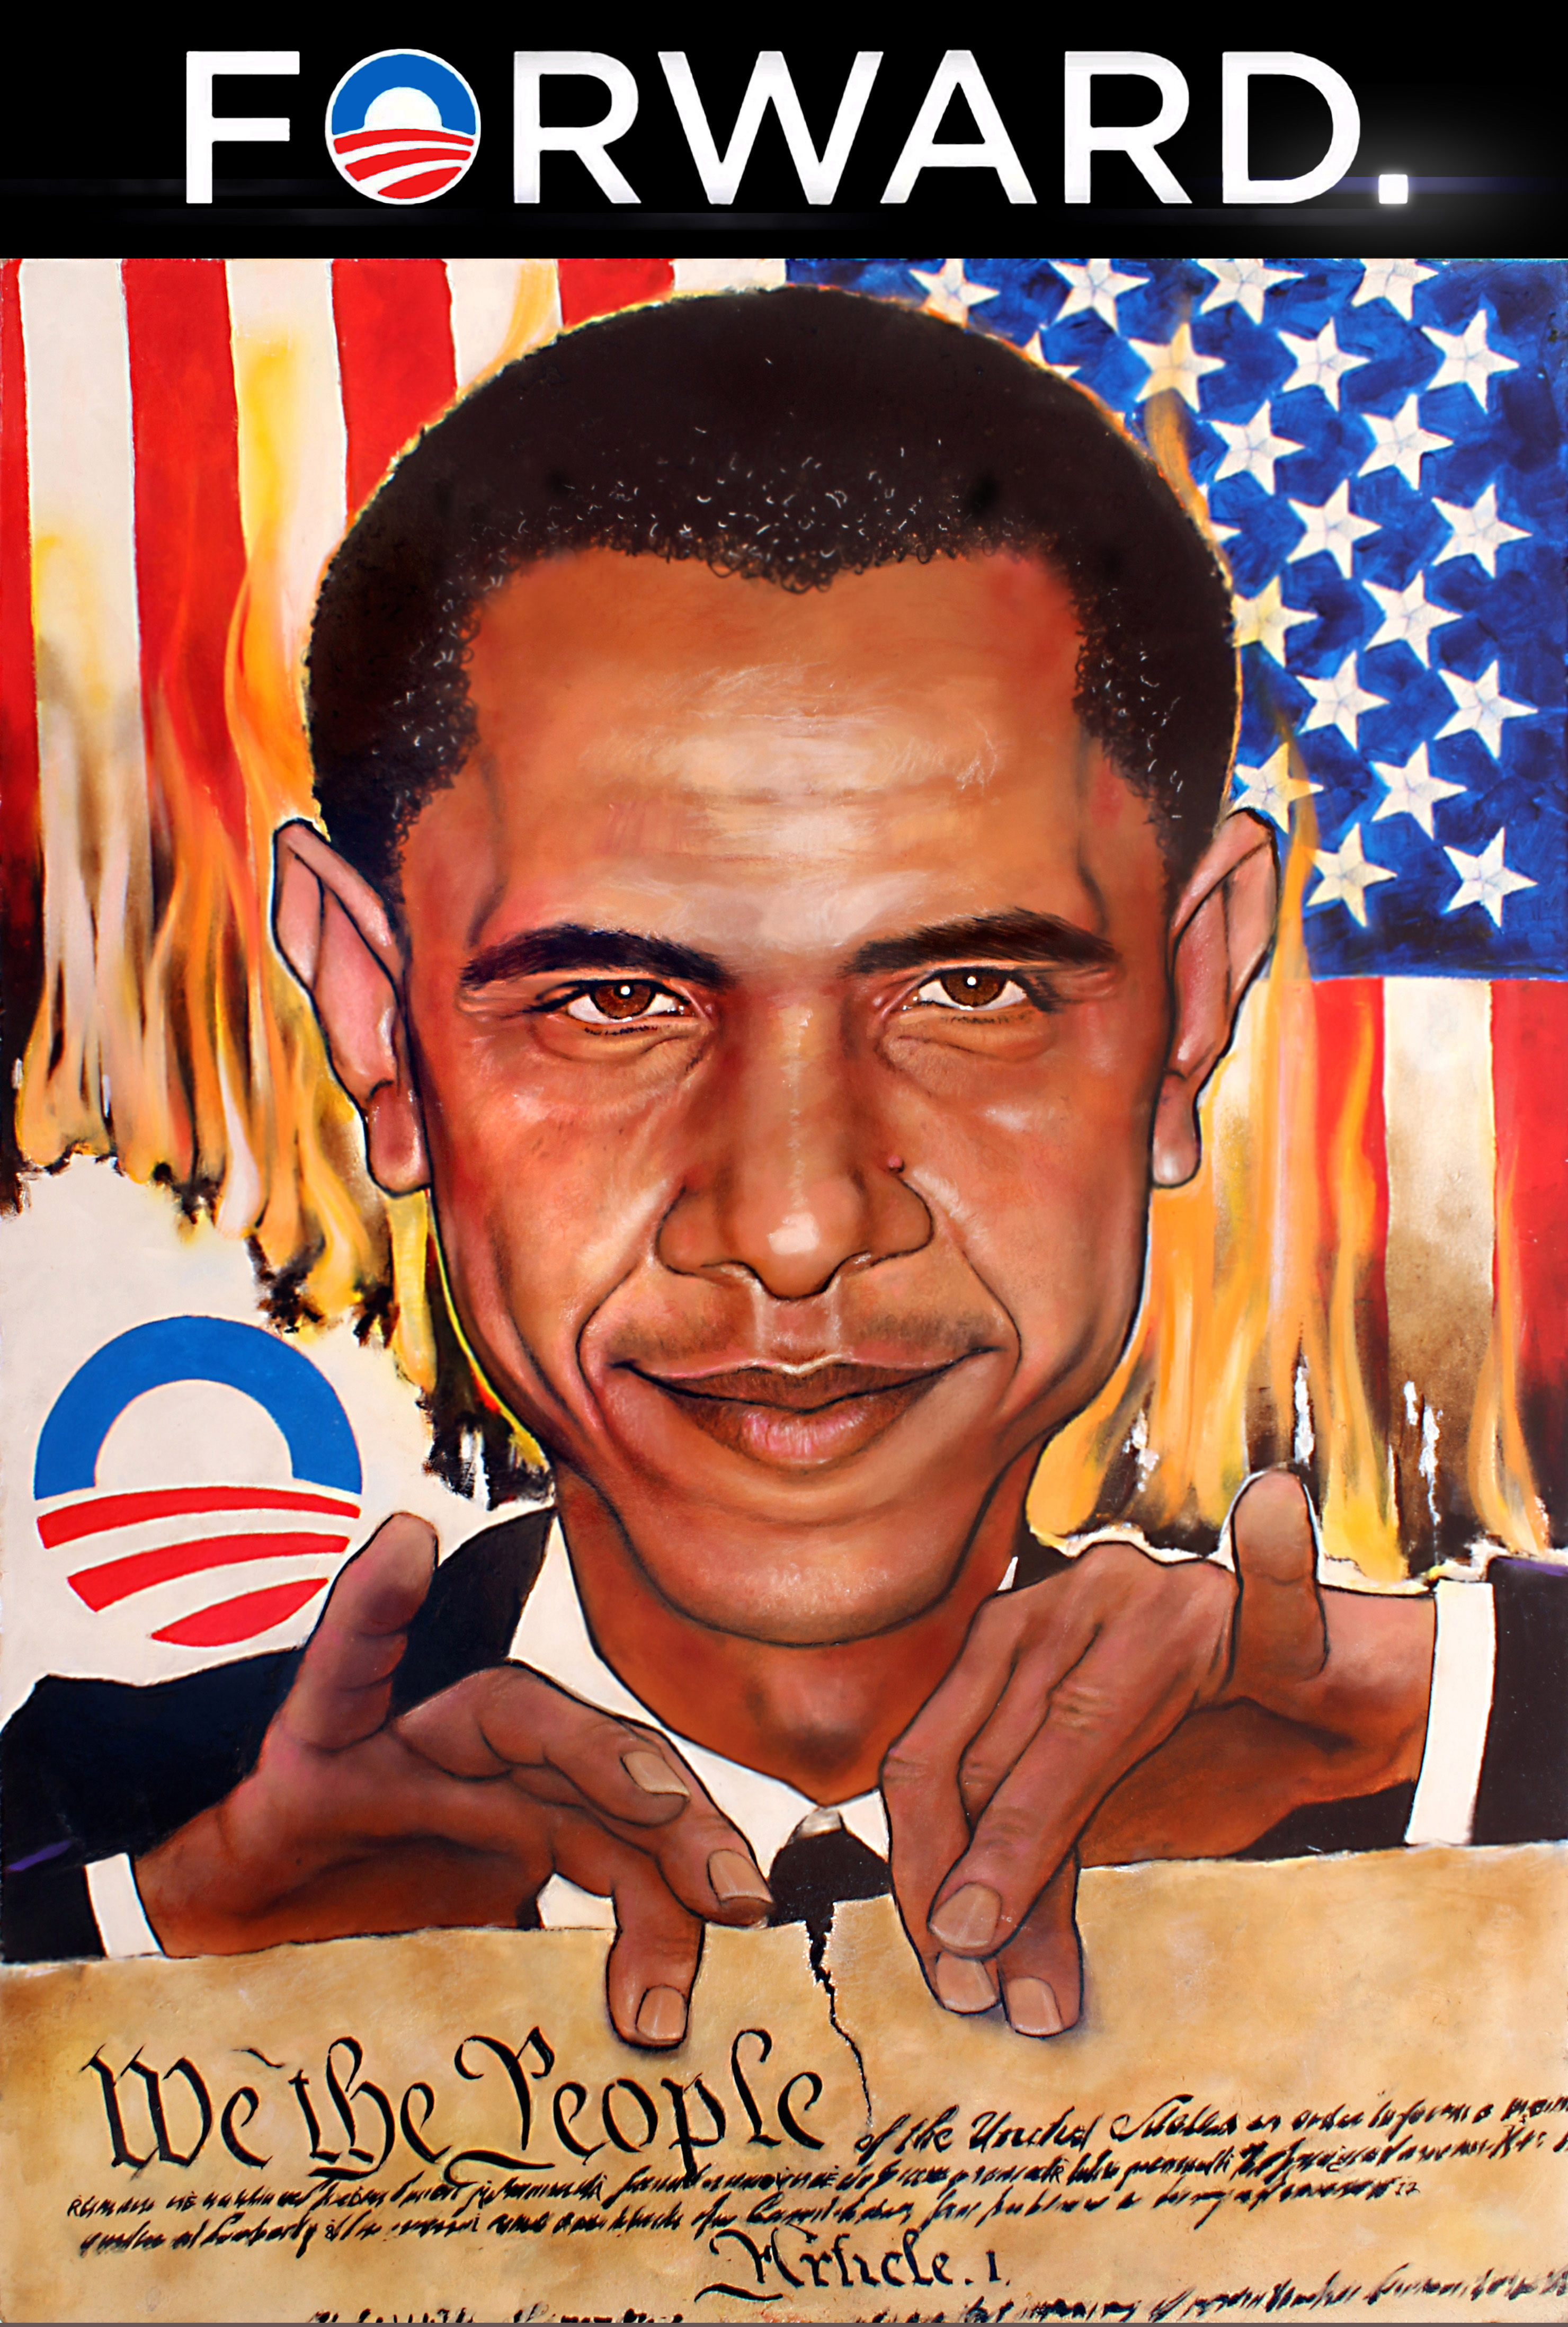 obama puts america in danger